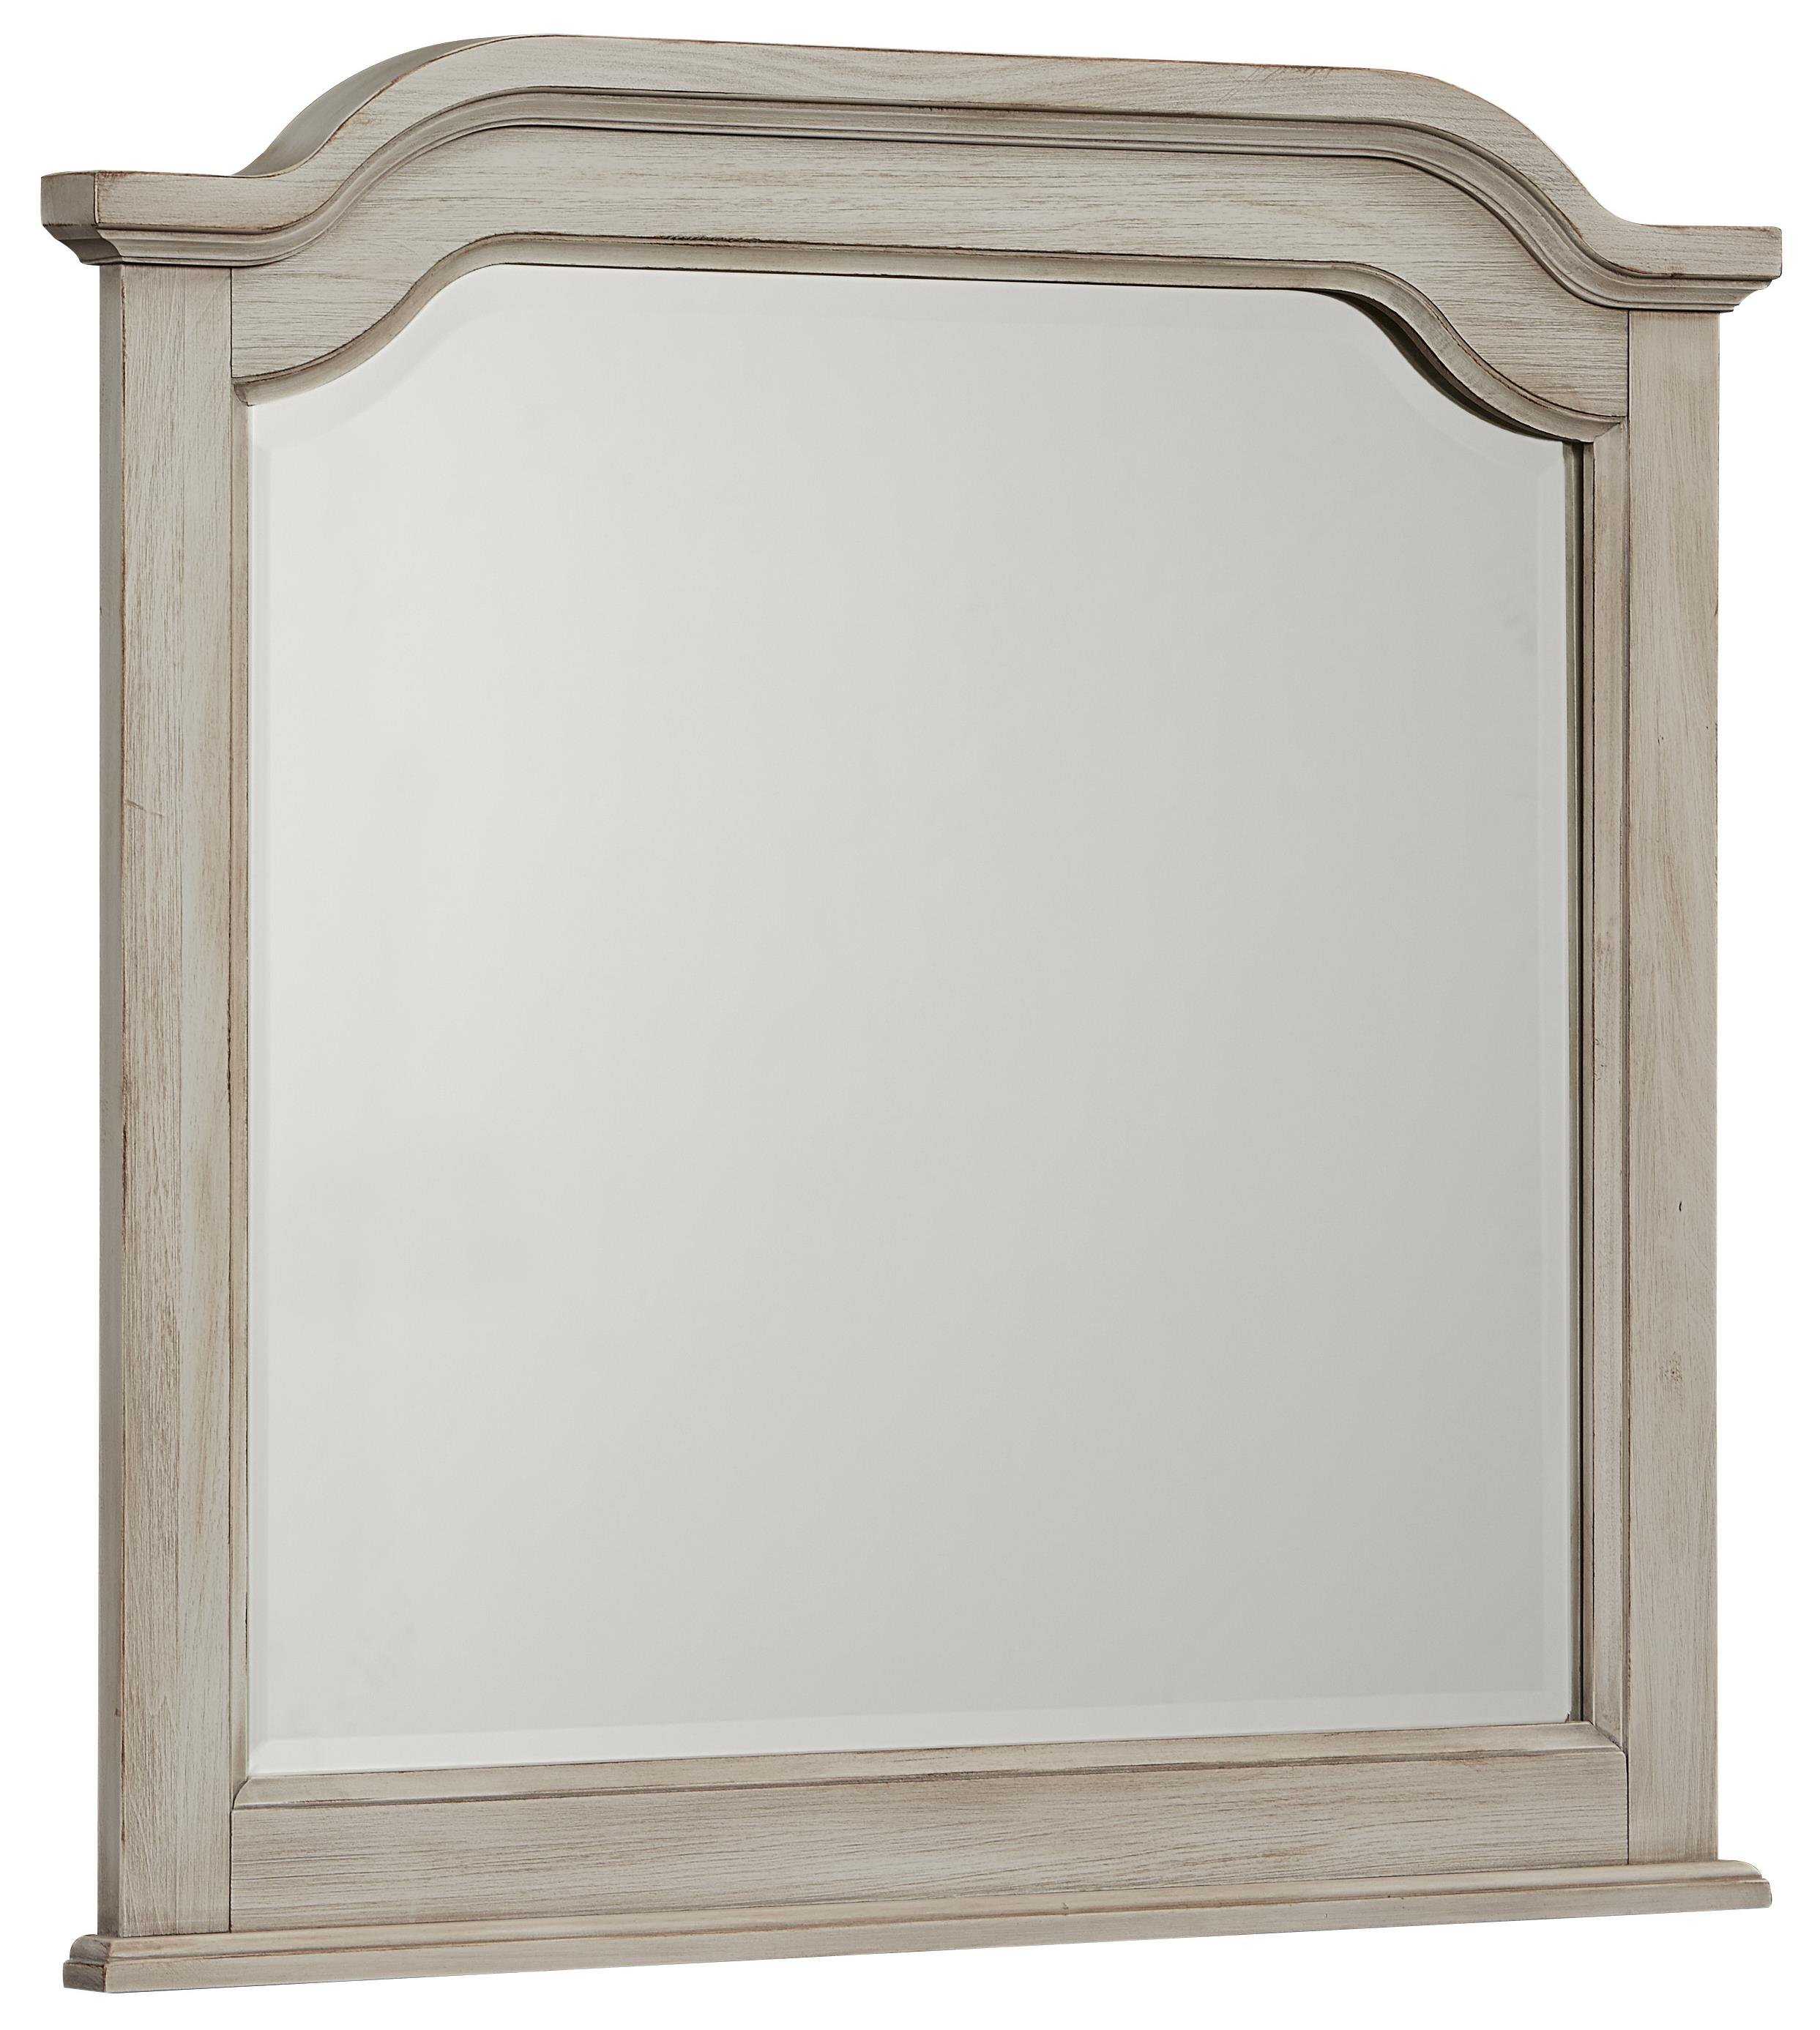 Vaughan Bassett Arrendelle Arch Mirror - Item Number: 442-446